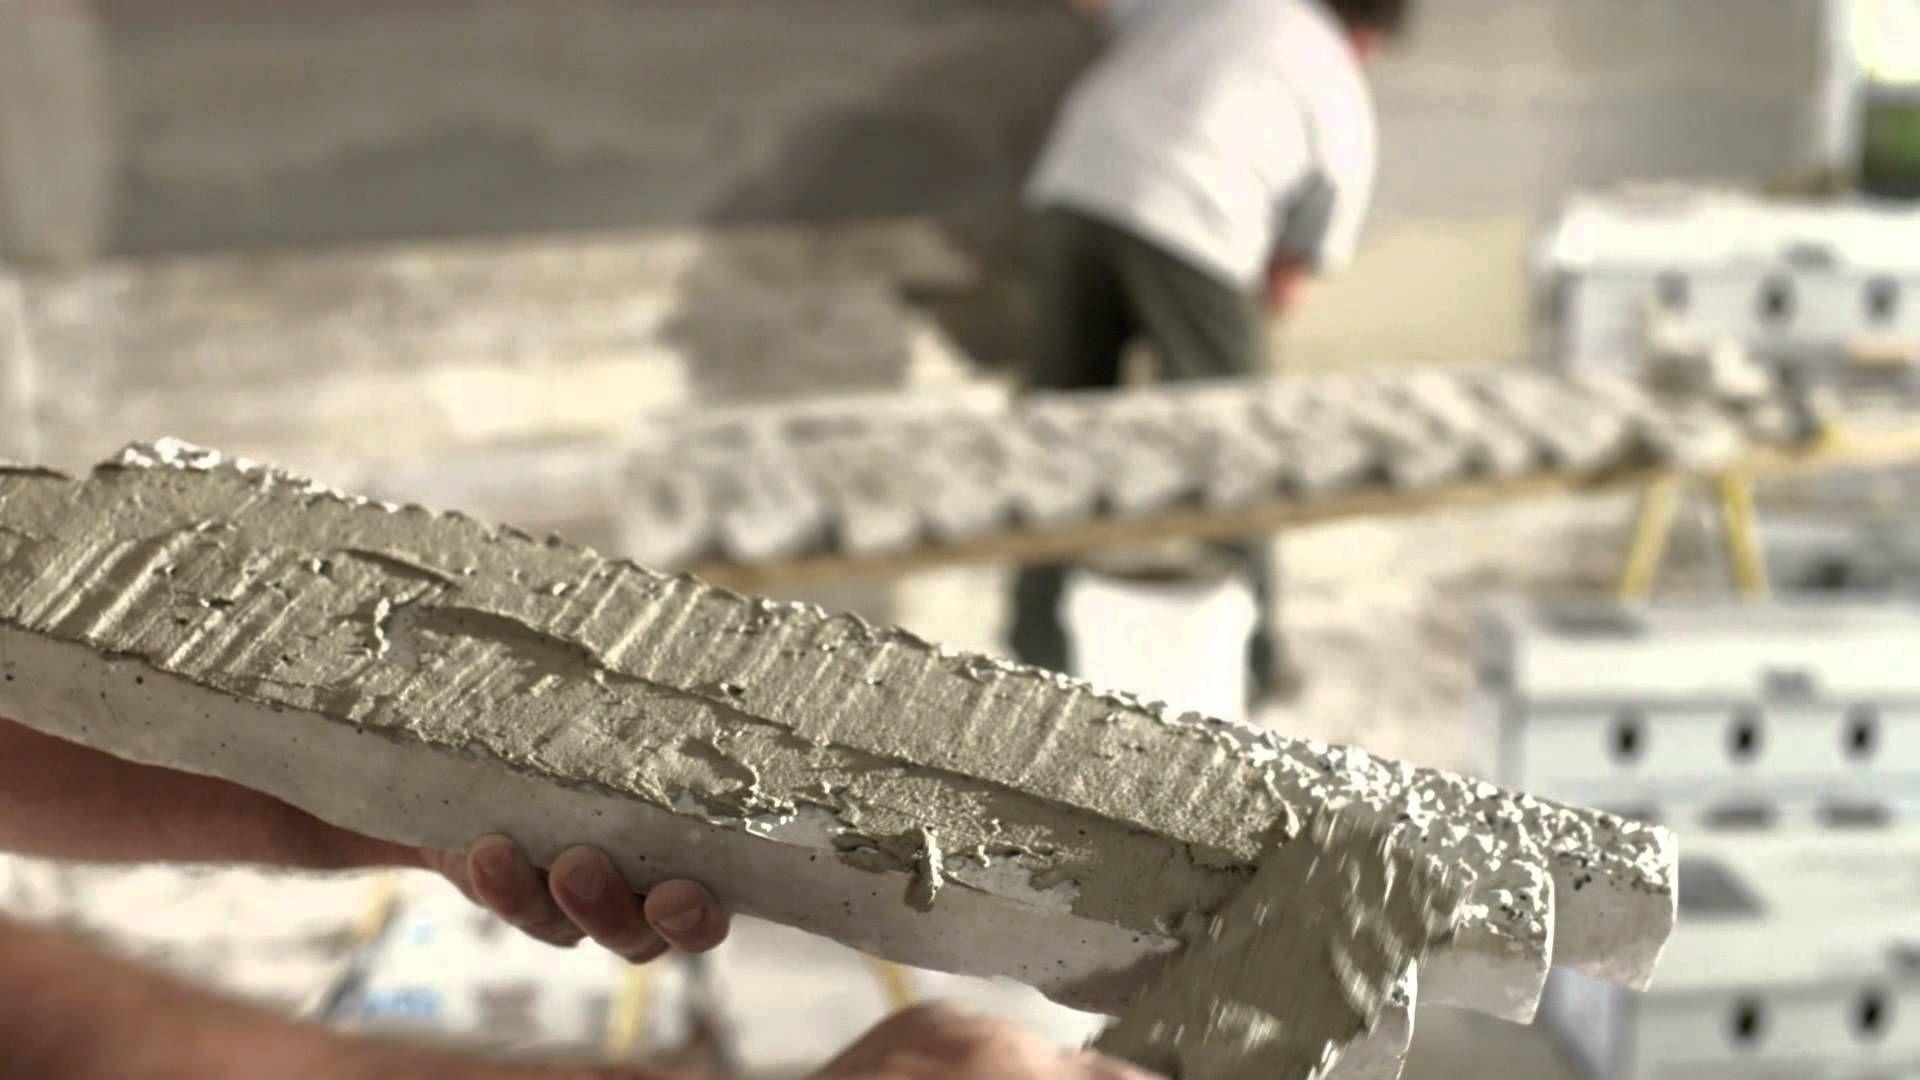 Eldorado Stone How To Install Stone Veneer Over Cement Board Eldorado Stone Manufactured Stone Veneer Stone Veneer